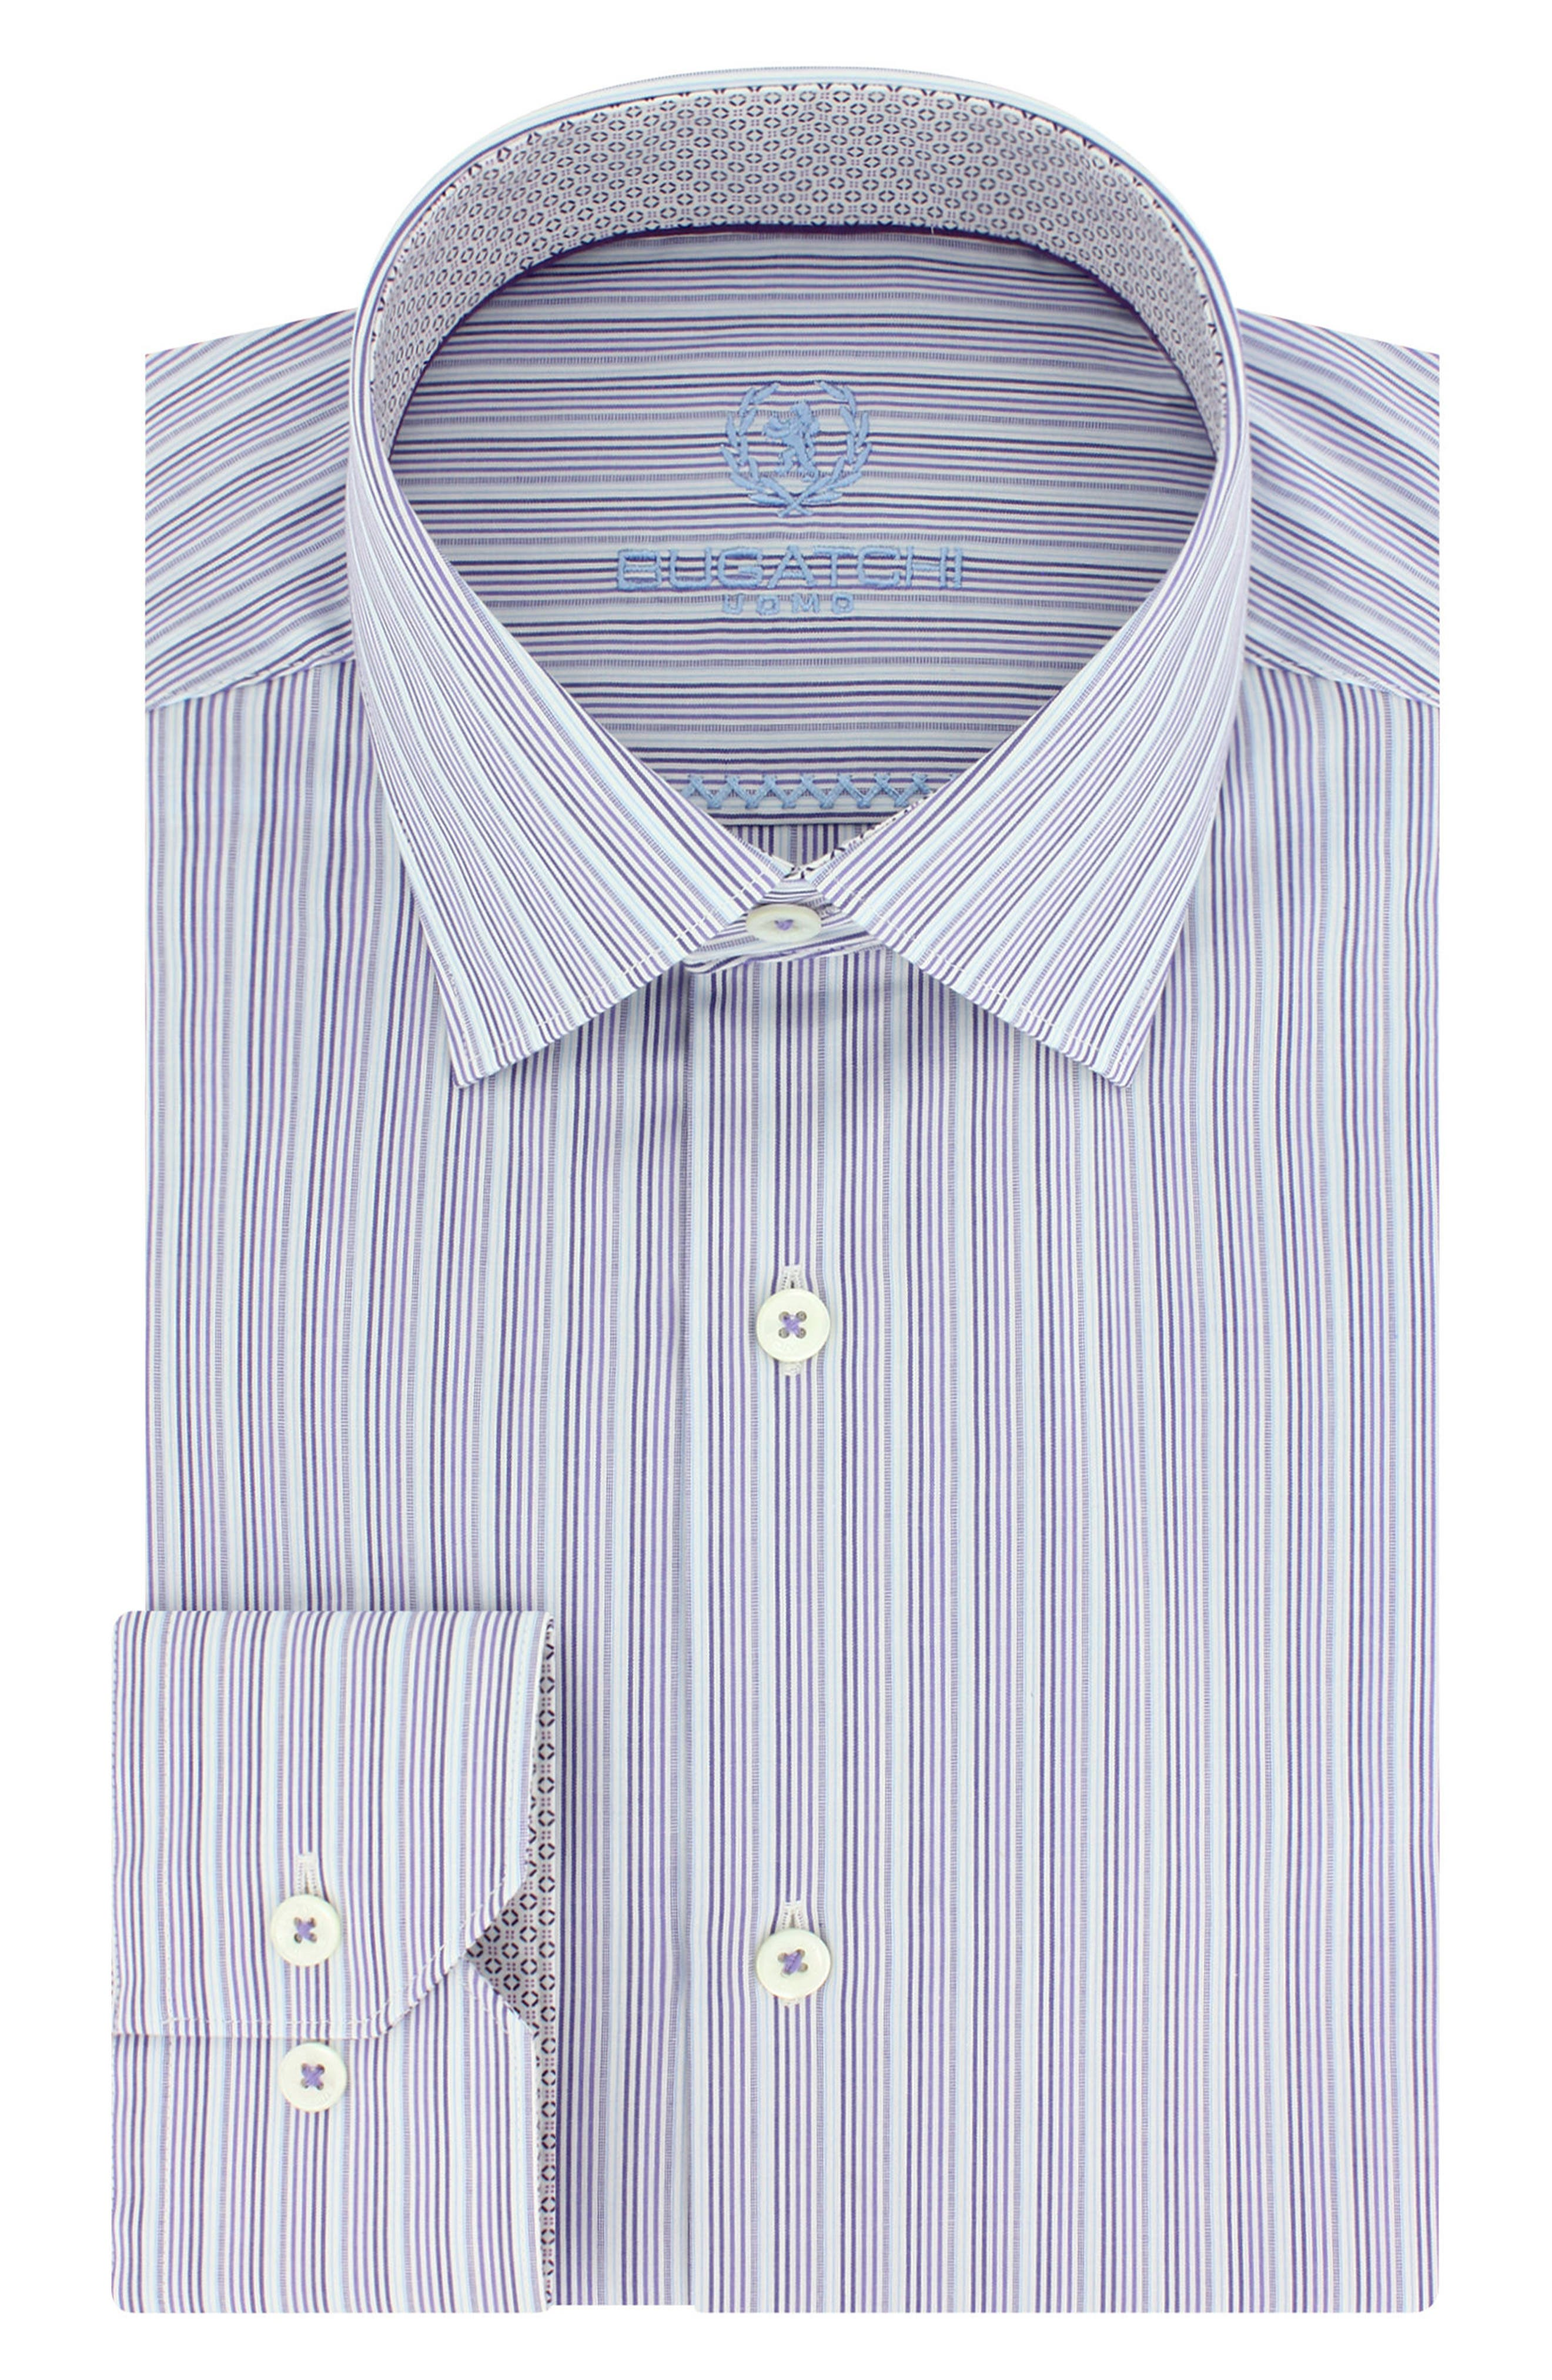 Trim Fit Stripe Dress Shirt,                             Main thumbnail 1, color,                             511